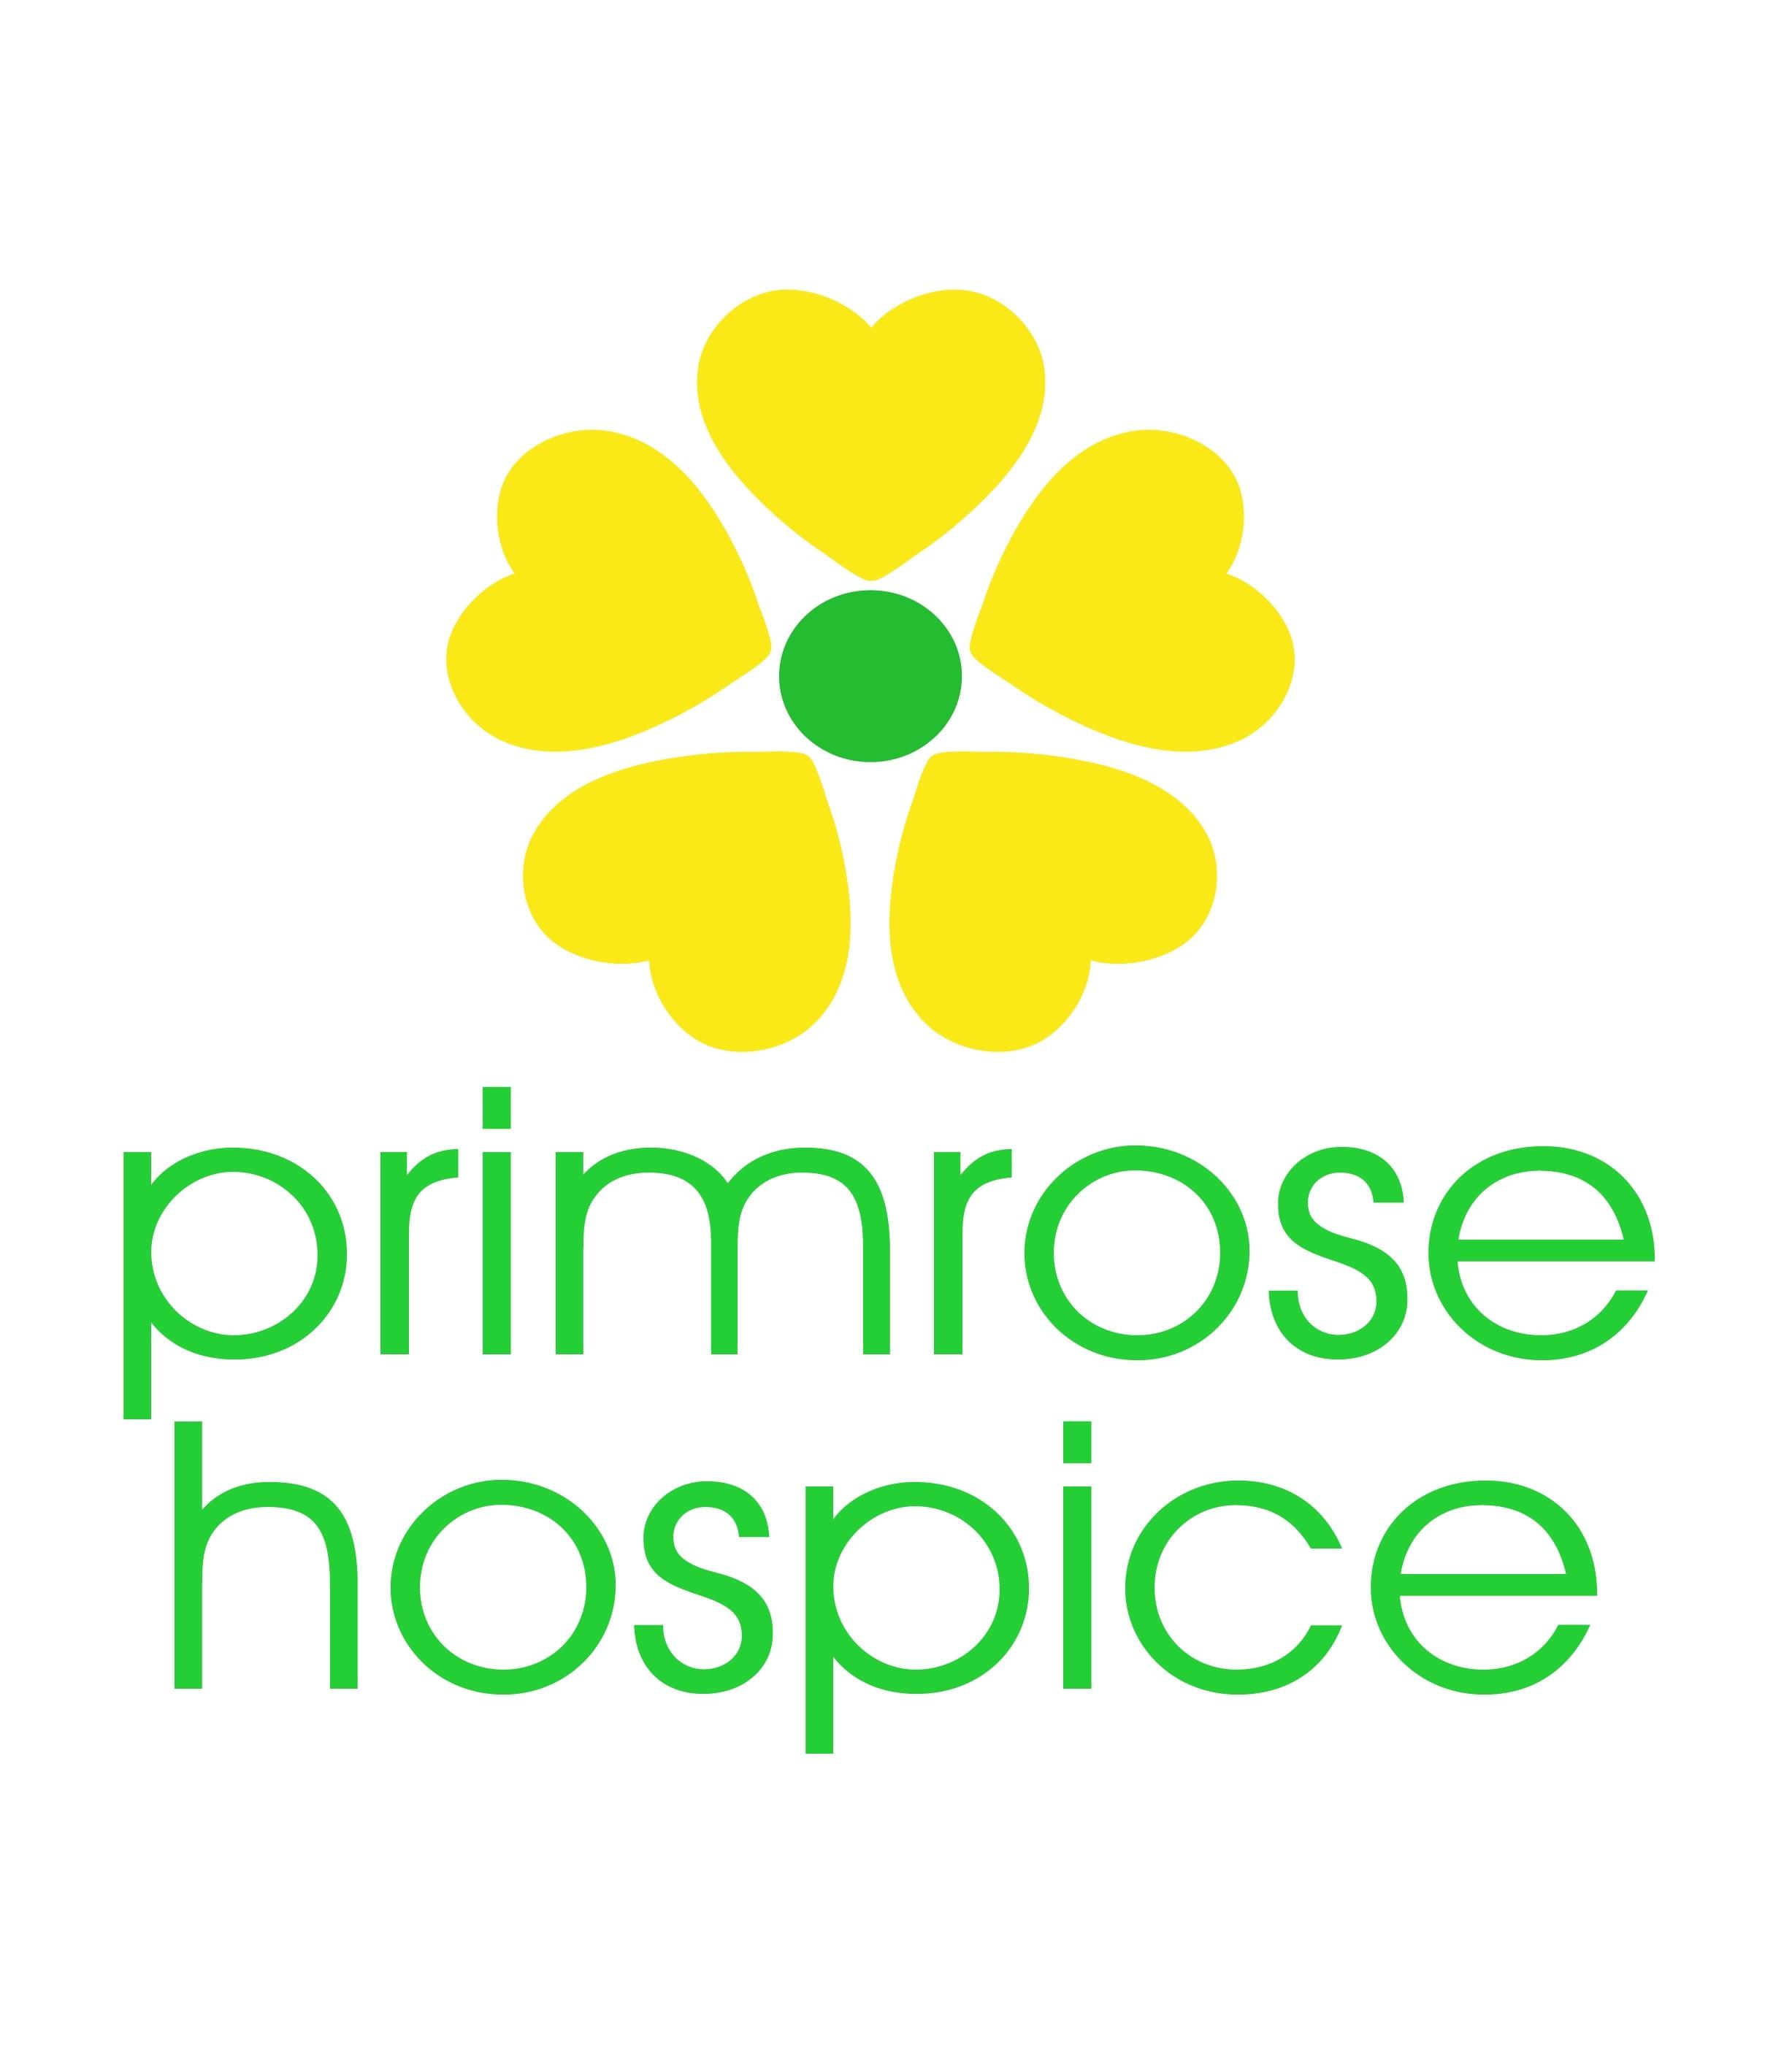 Primrose Hospice